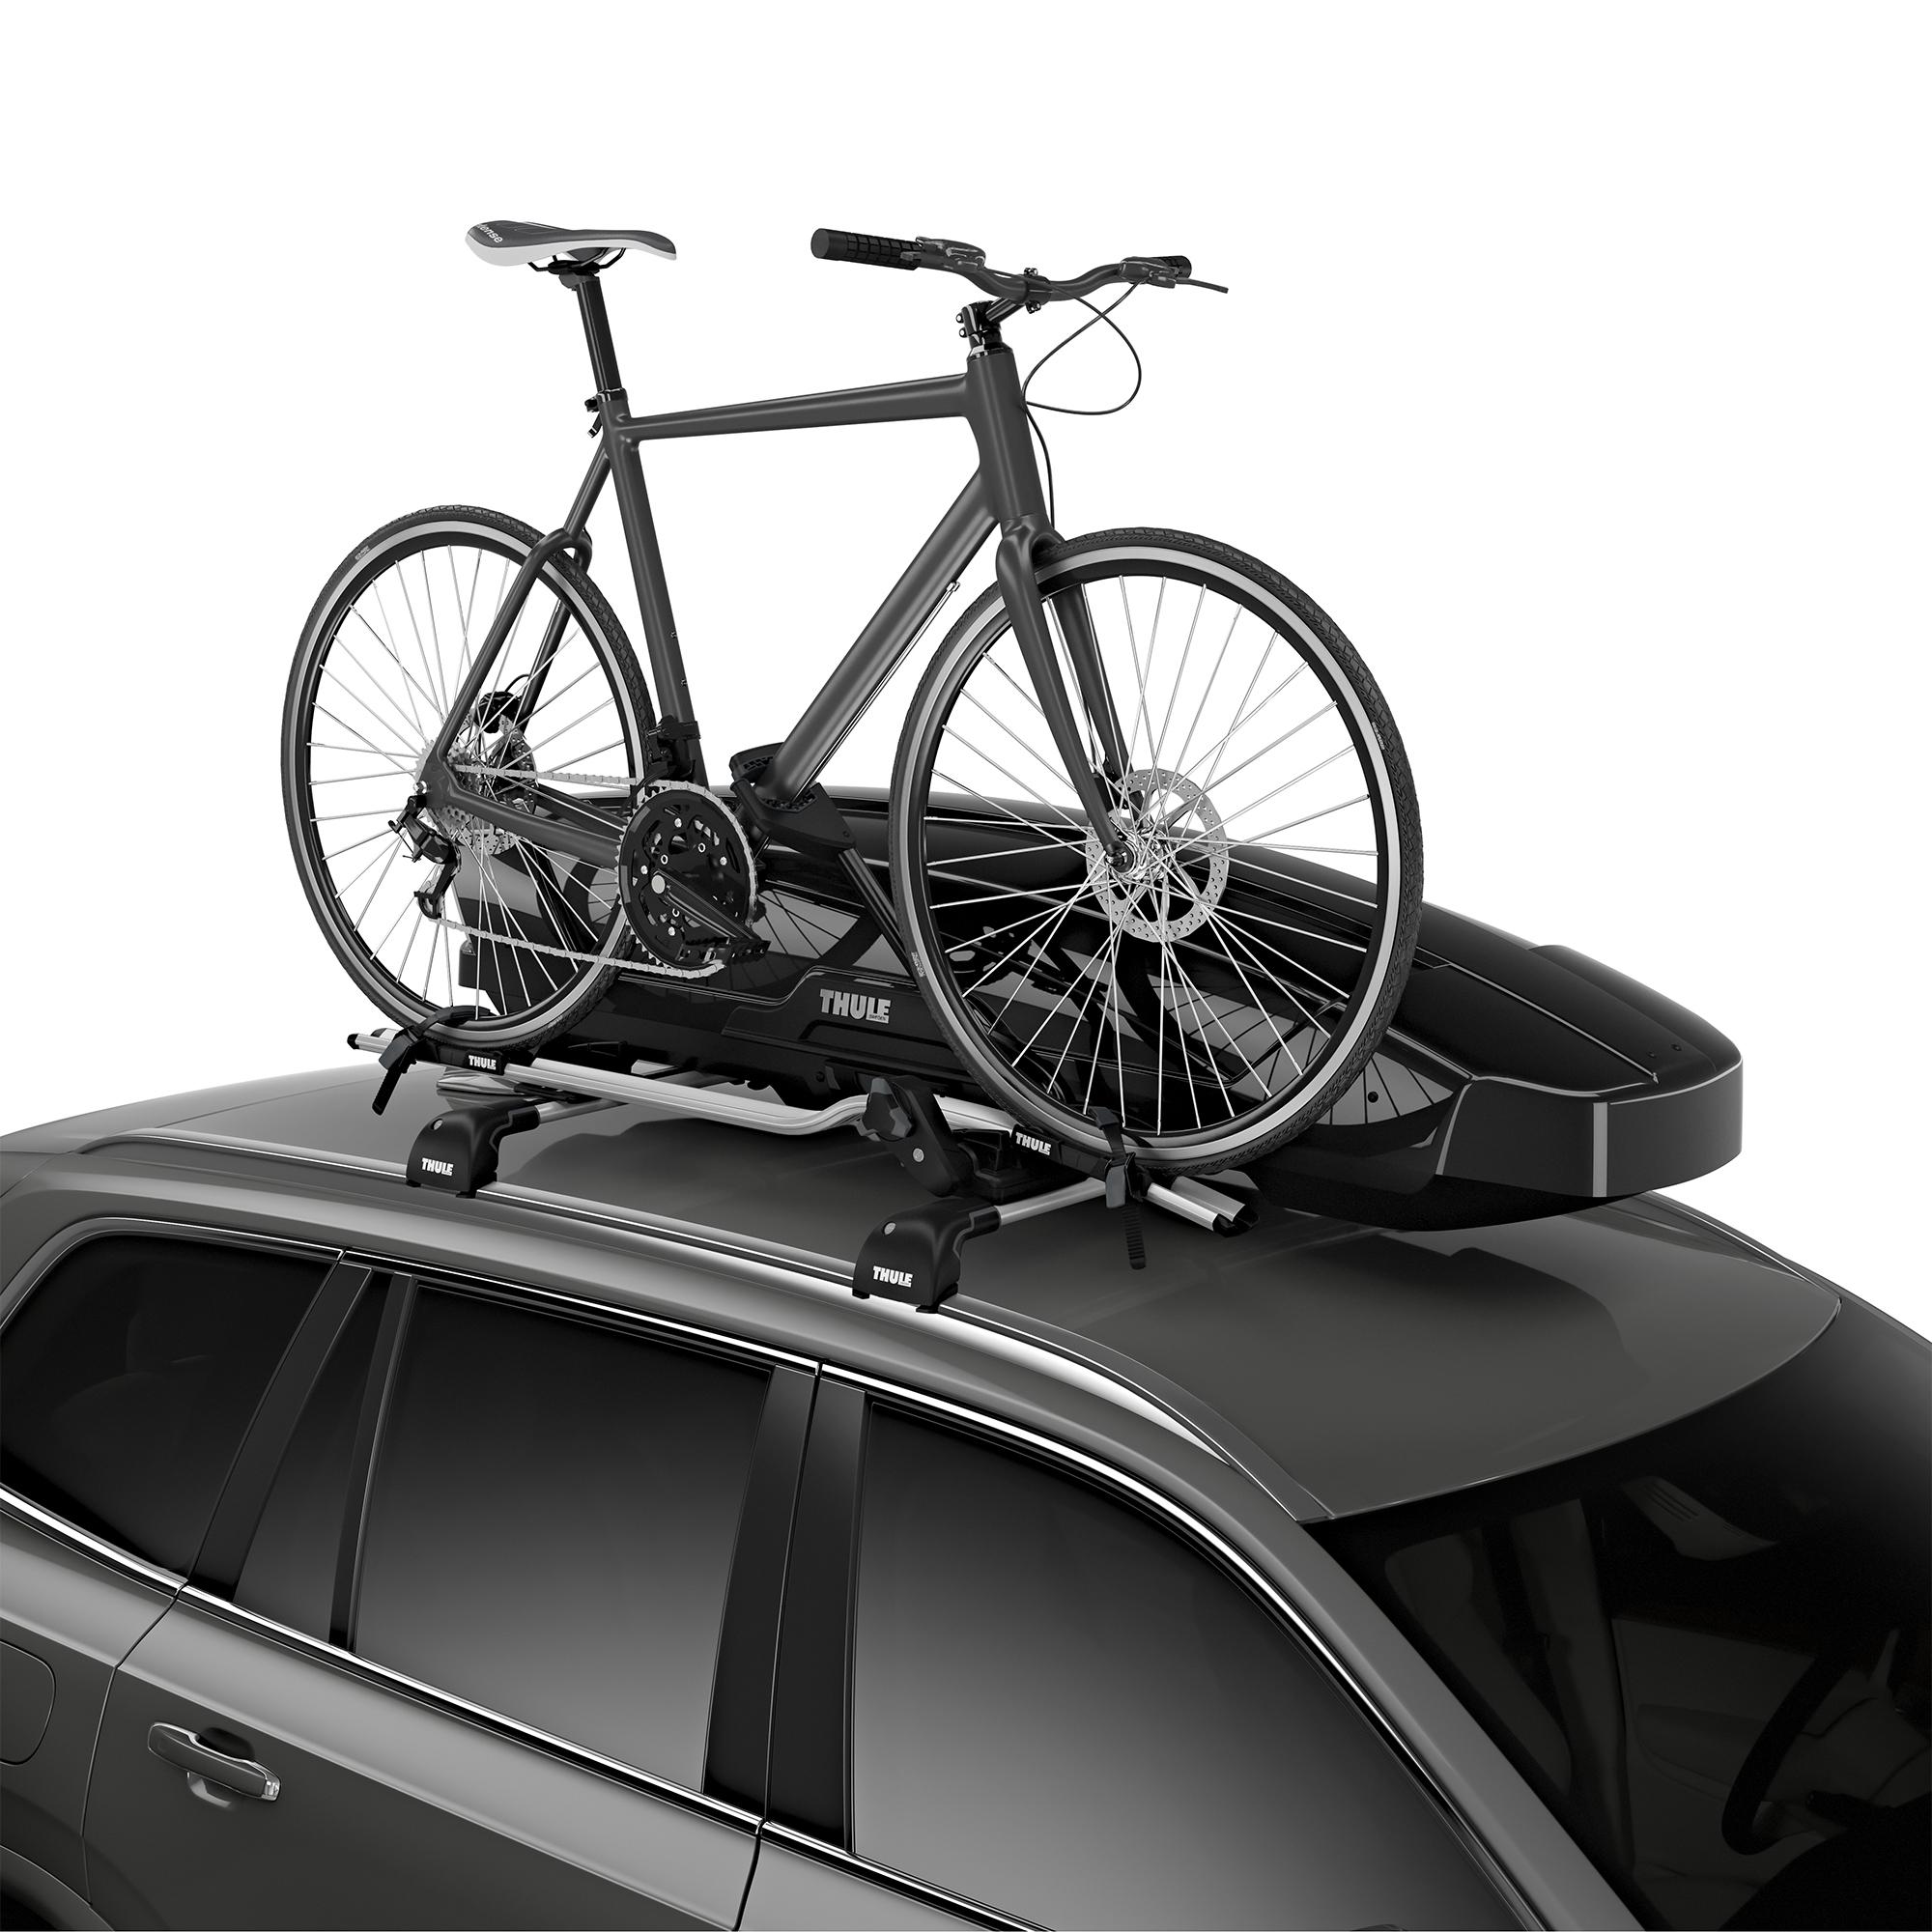 Dachbox THULE Motion XT SPORT schwarz glänzend | Motion XT ...